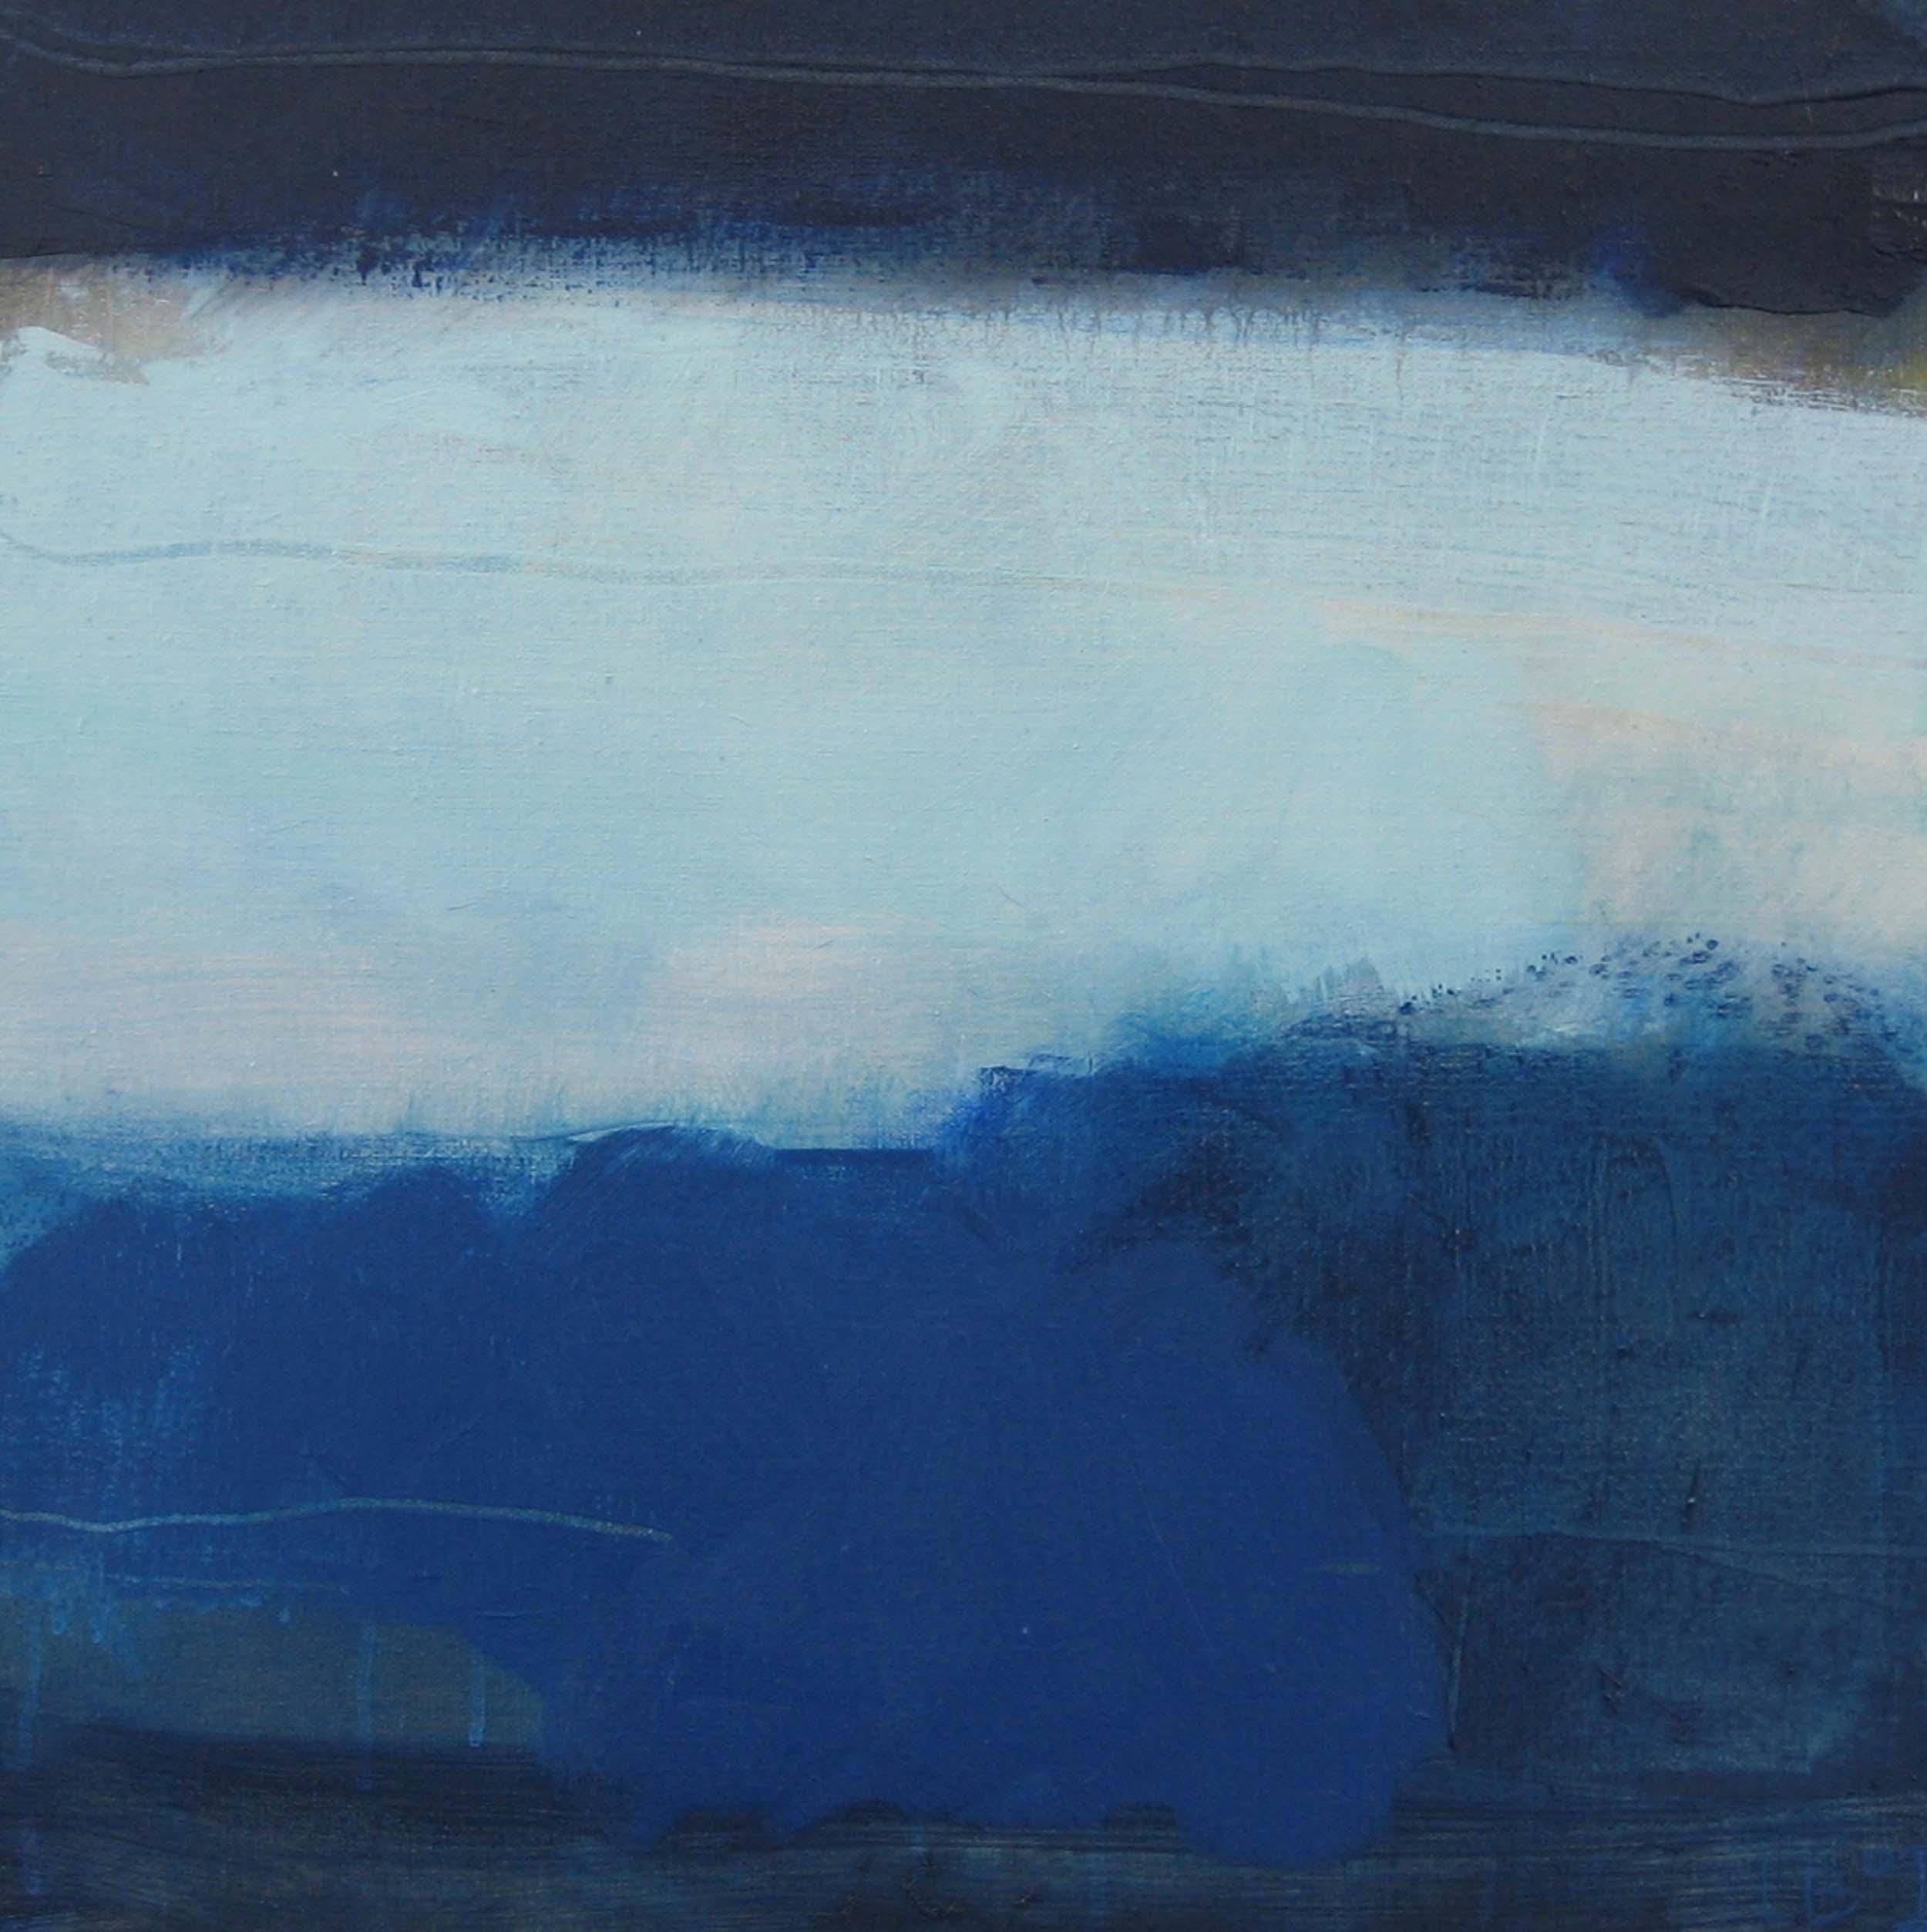 Leah Beggs 2009 - Connemara Blues III  - Oil on Canvas  - 41 x 41 cm_sml.jpg